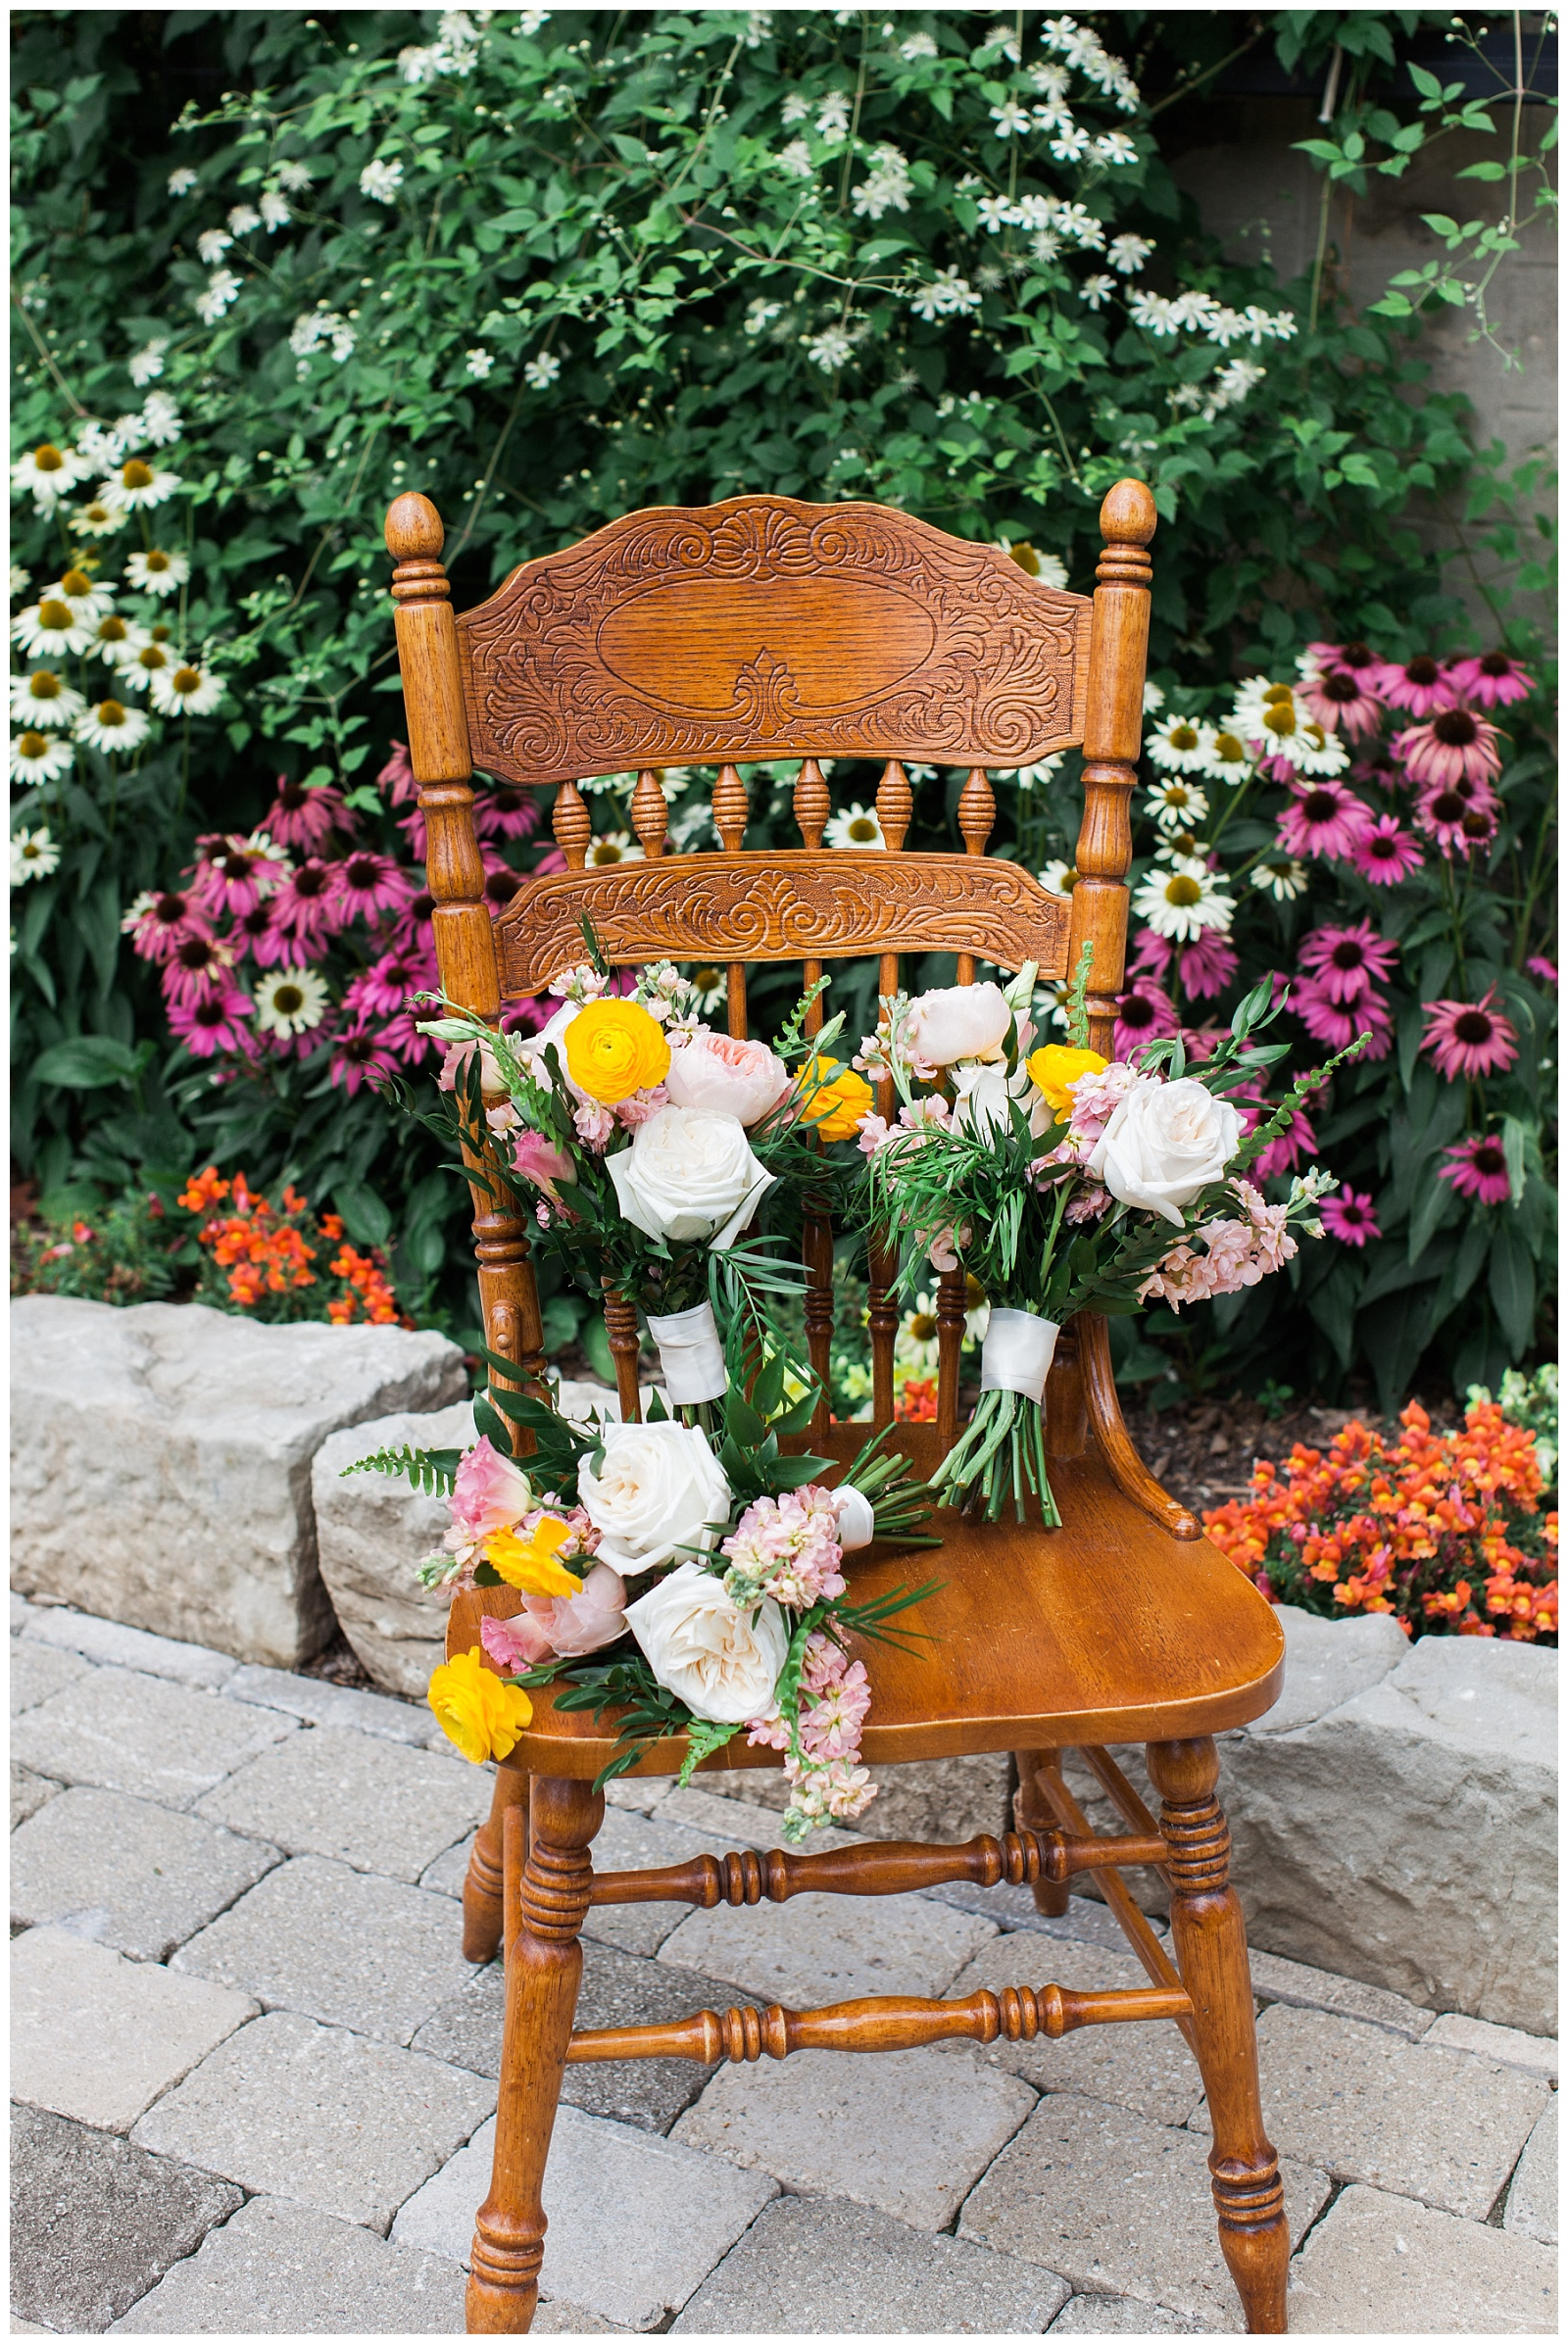 Flower bouquet on antique chair at Guelph Ontario Wedding | Ontario Wedding Photographer | Toronto Wedding Photographer | 3photography